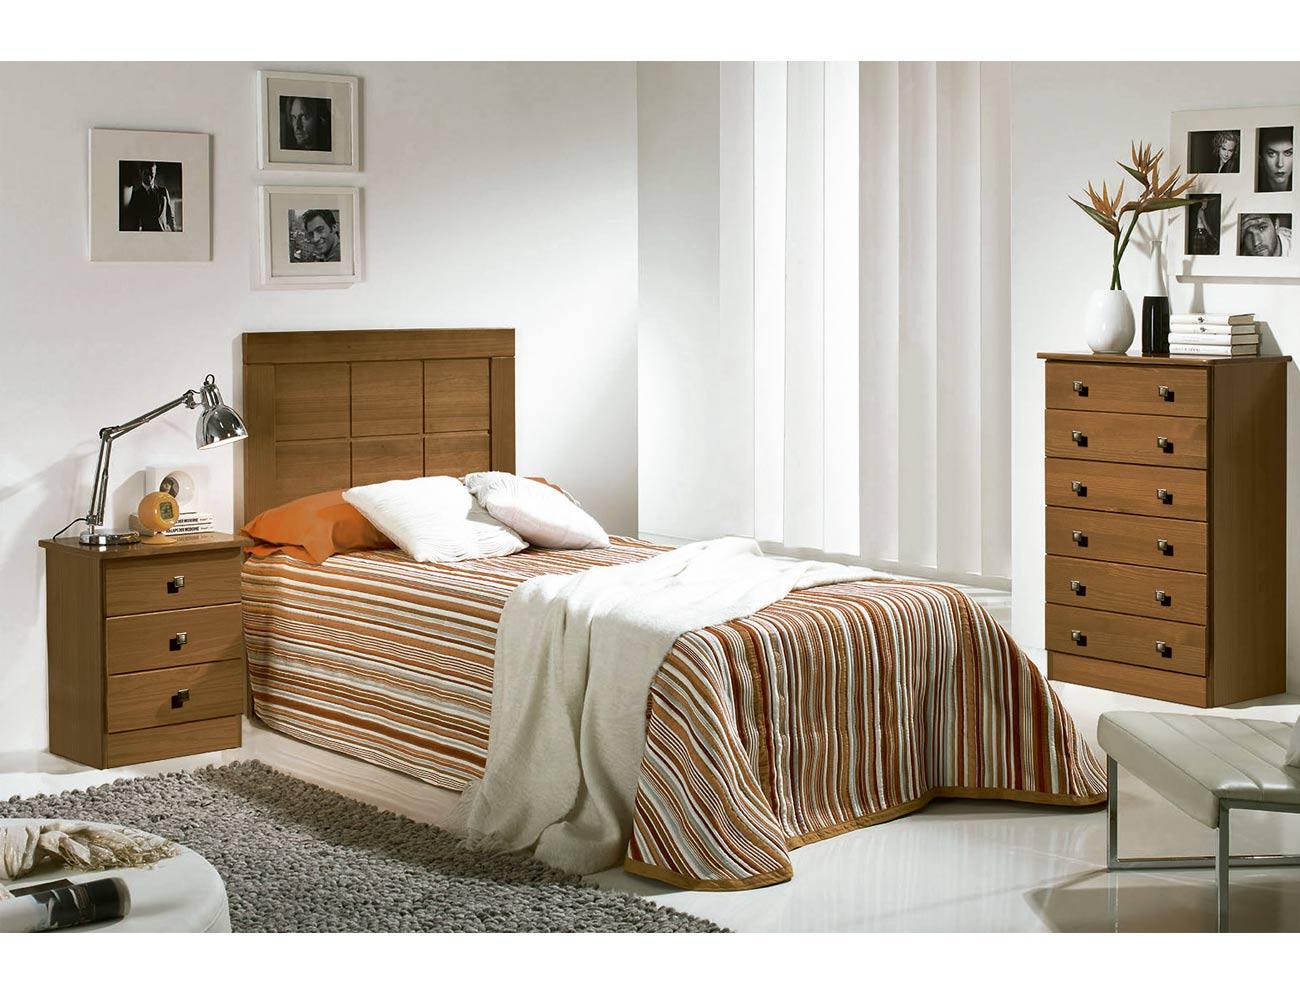 Dormitorio juvenil kenia madera nogal1